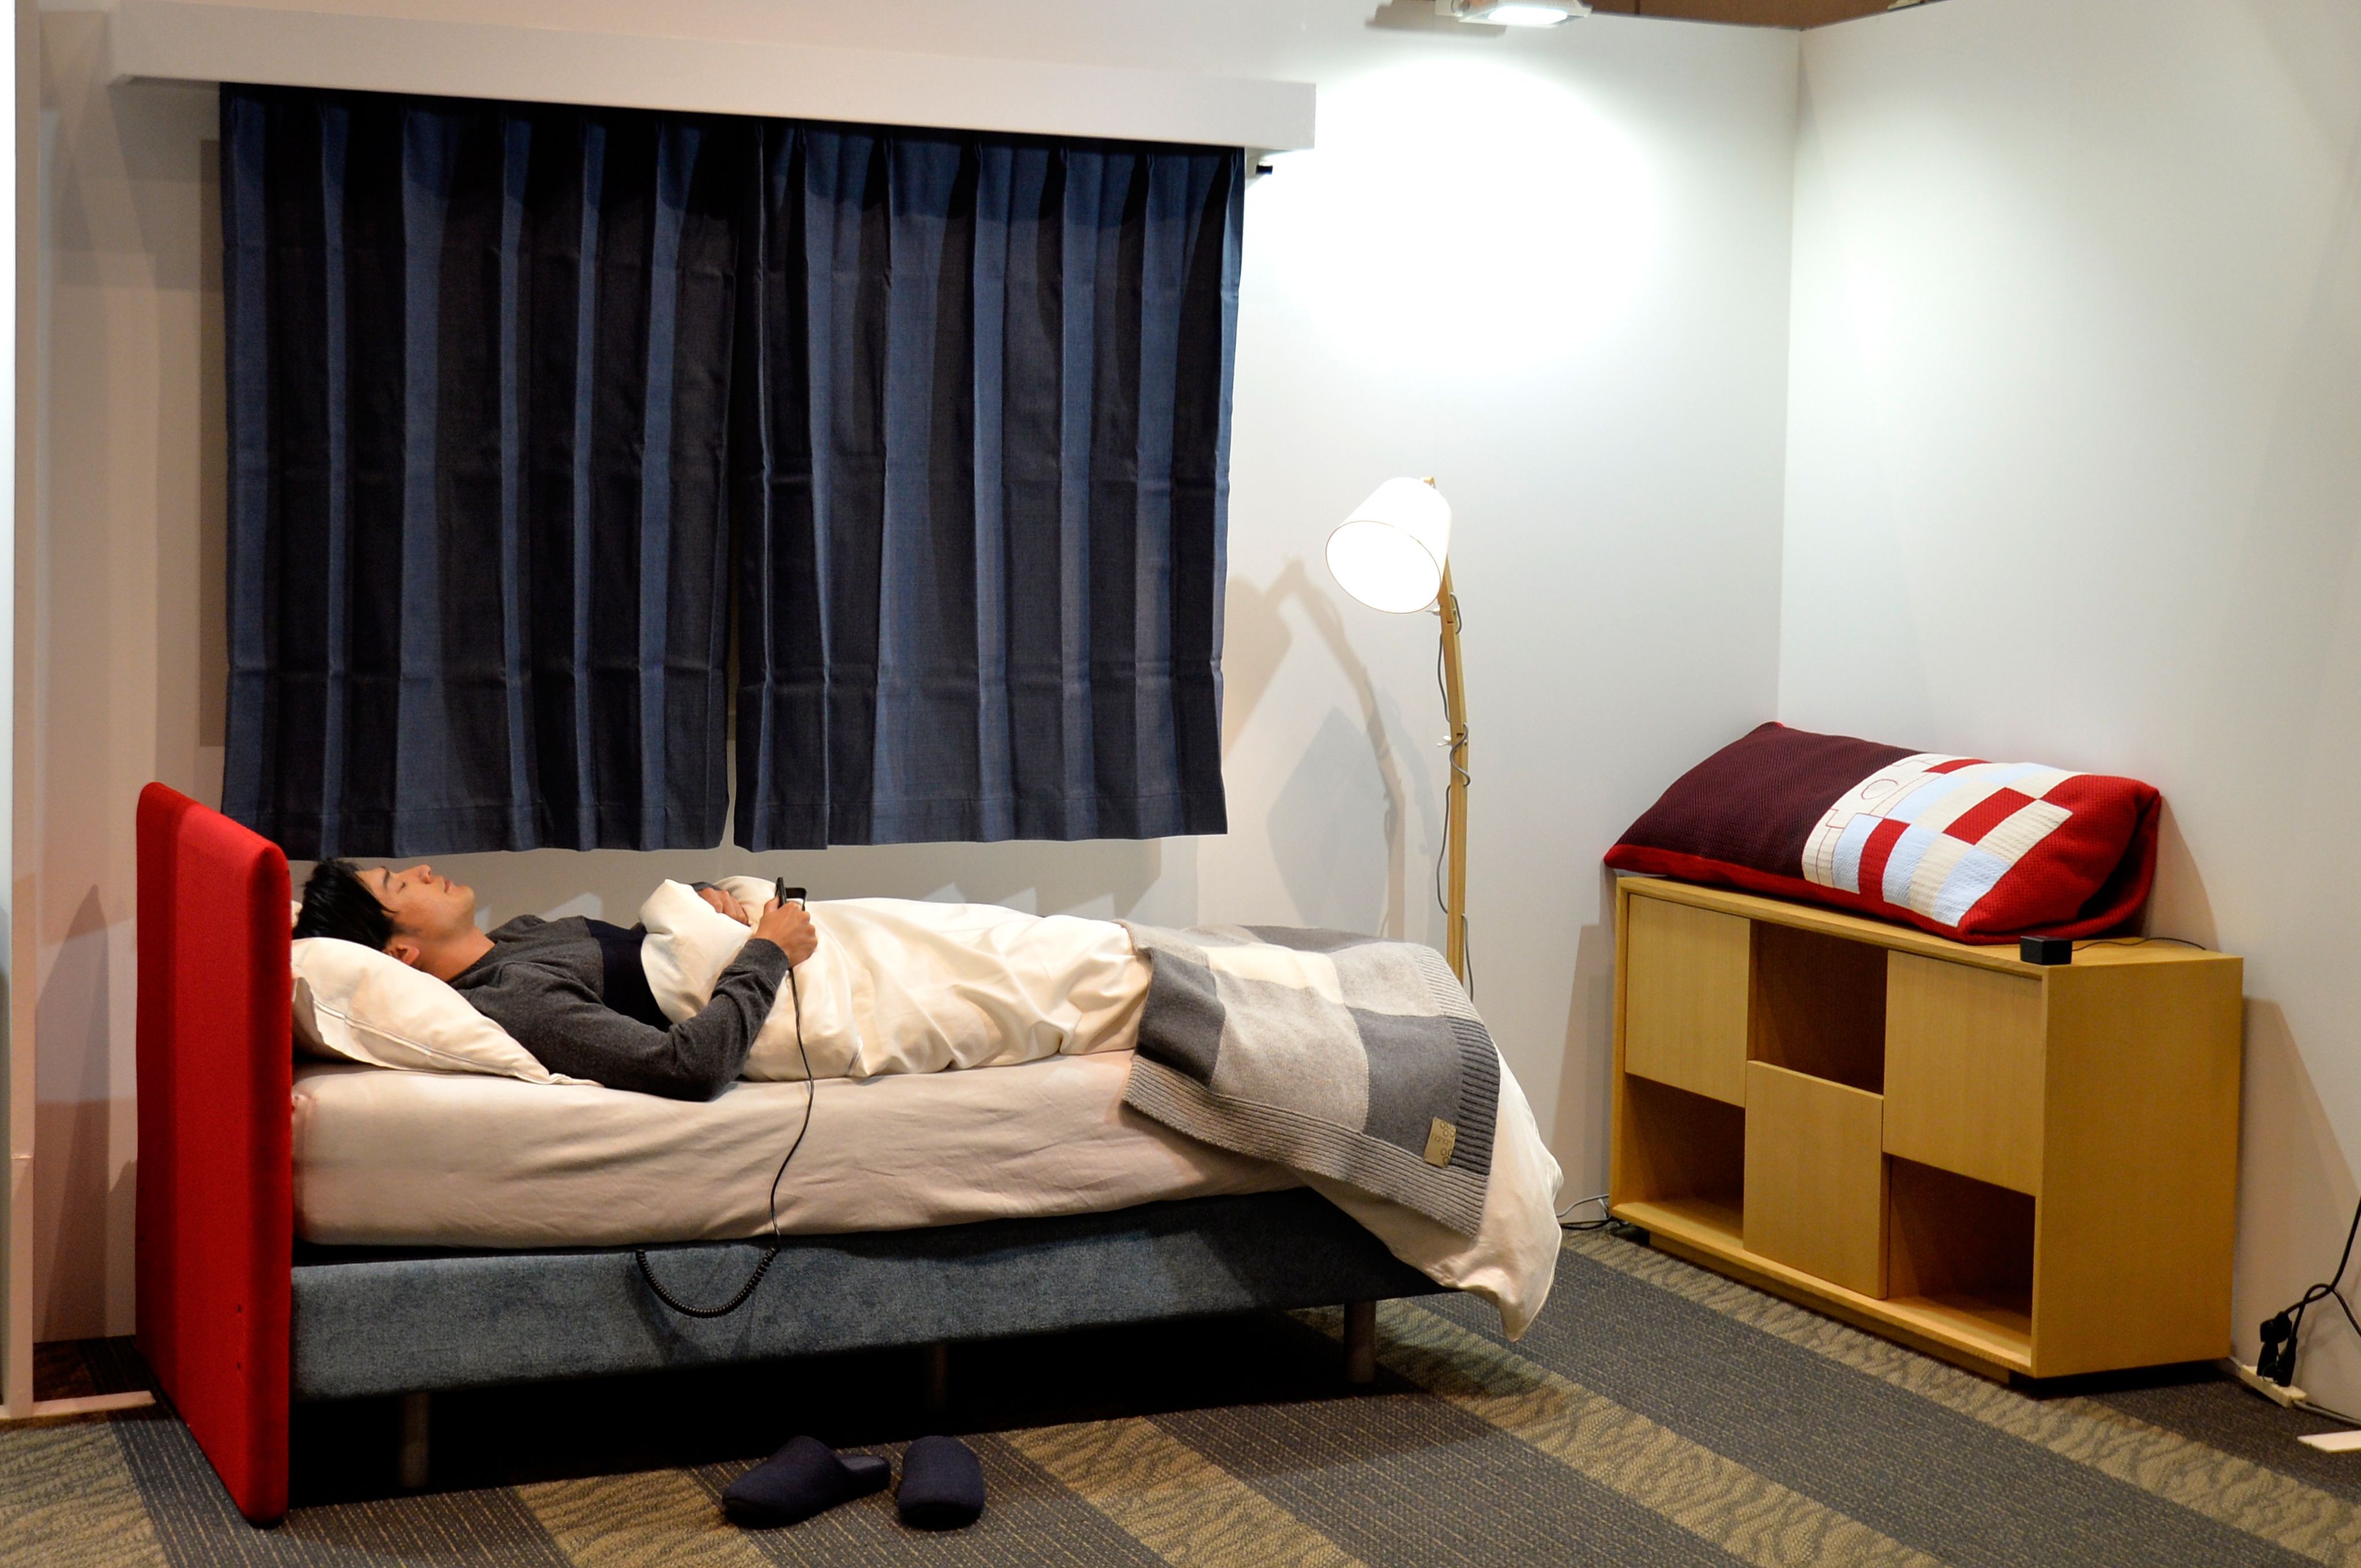 KDDIの睡眠サービス「Real Sleep」